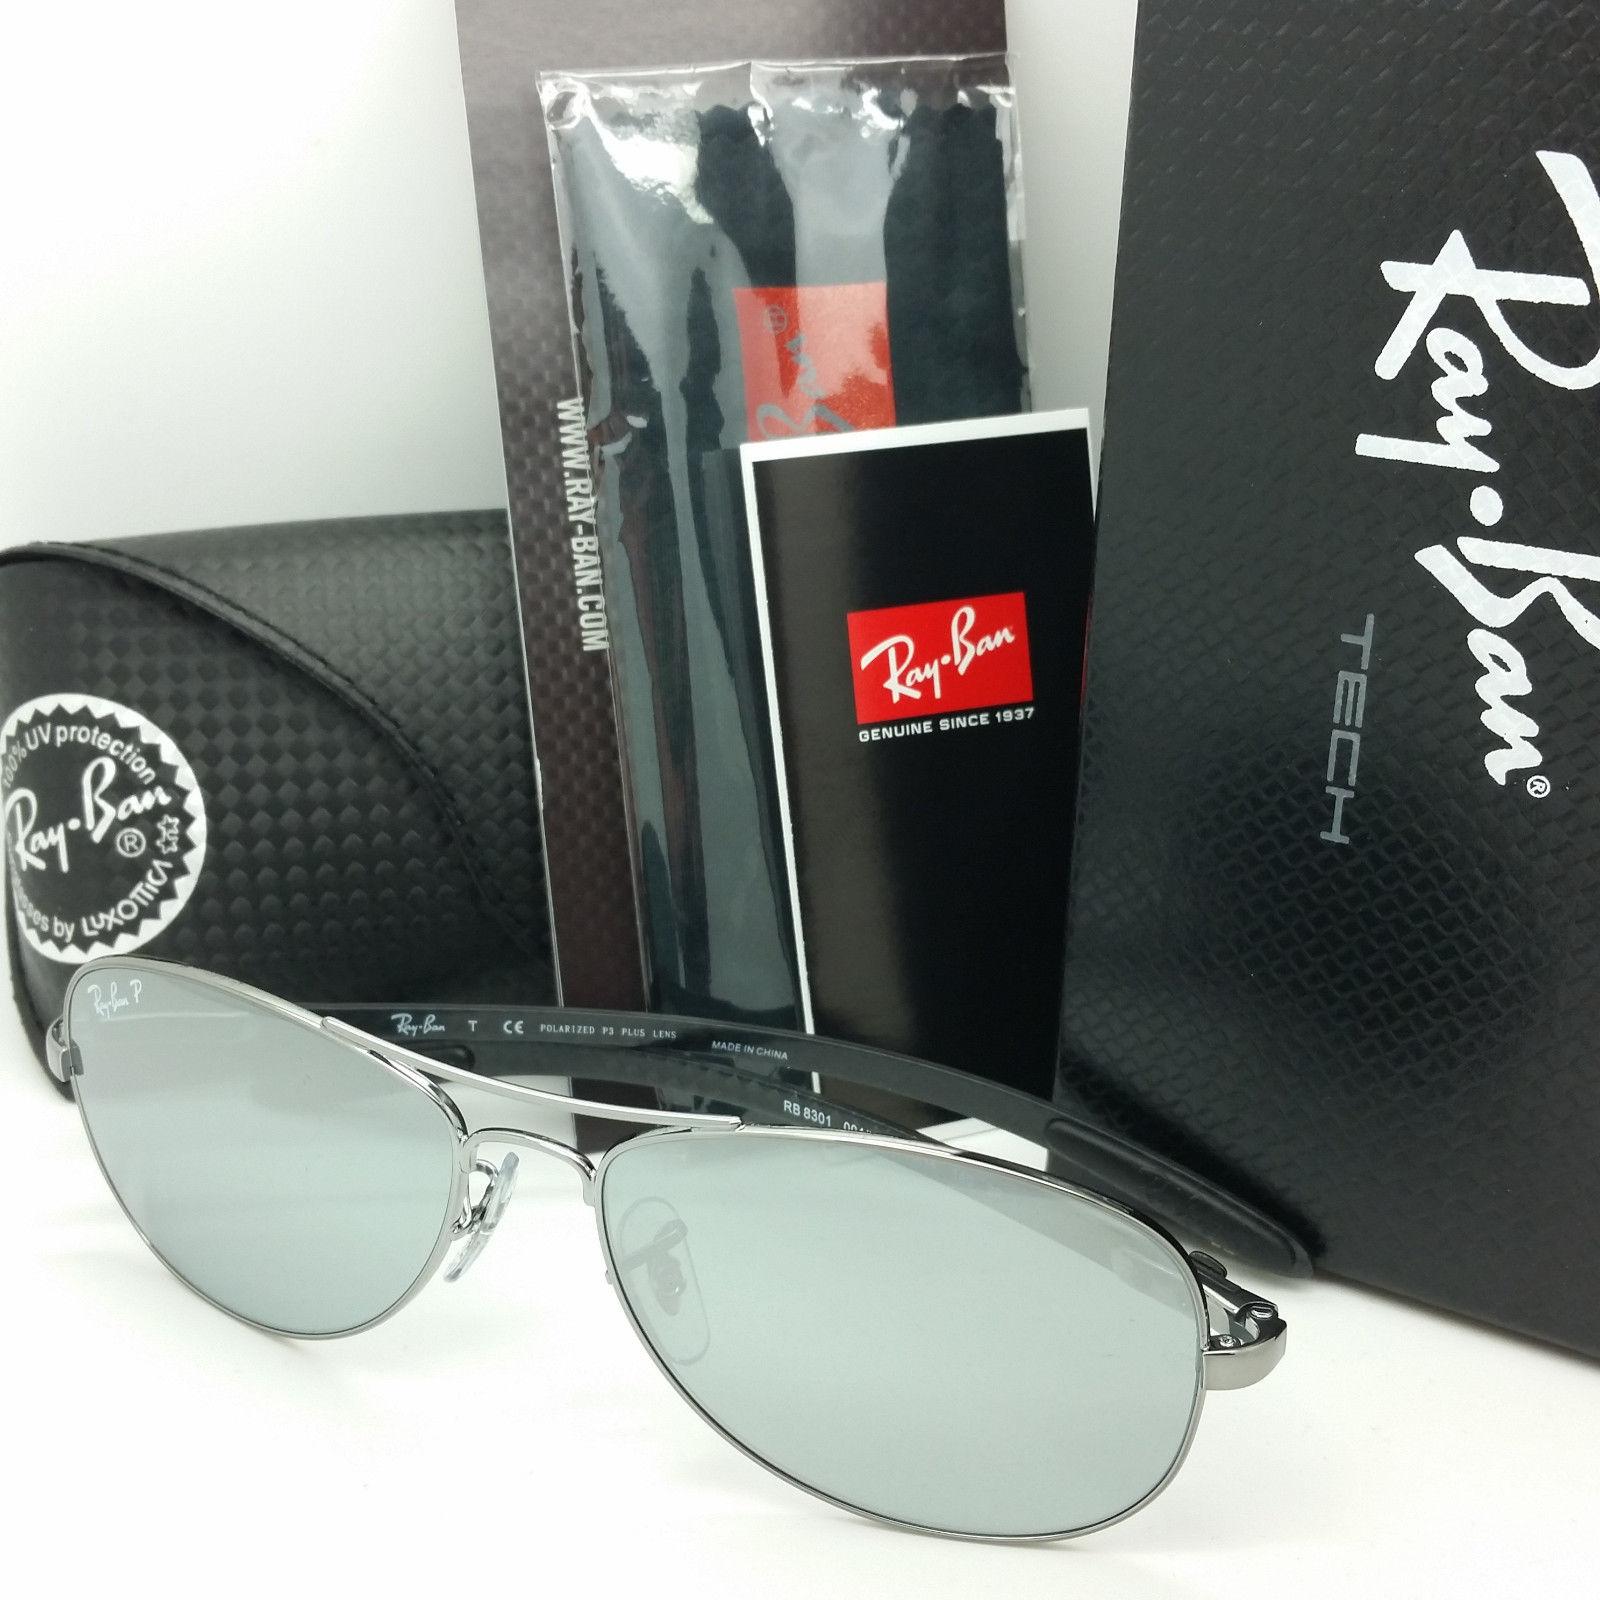 RAY BAN RB8301 004/K6 TECH Silver Mirror Polarized 59mm